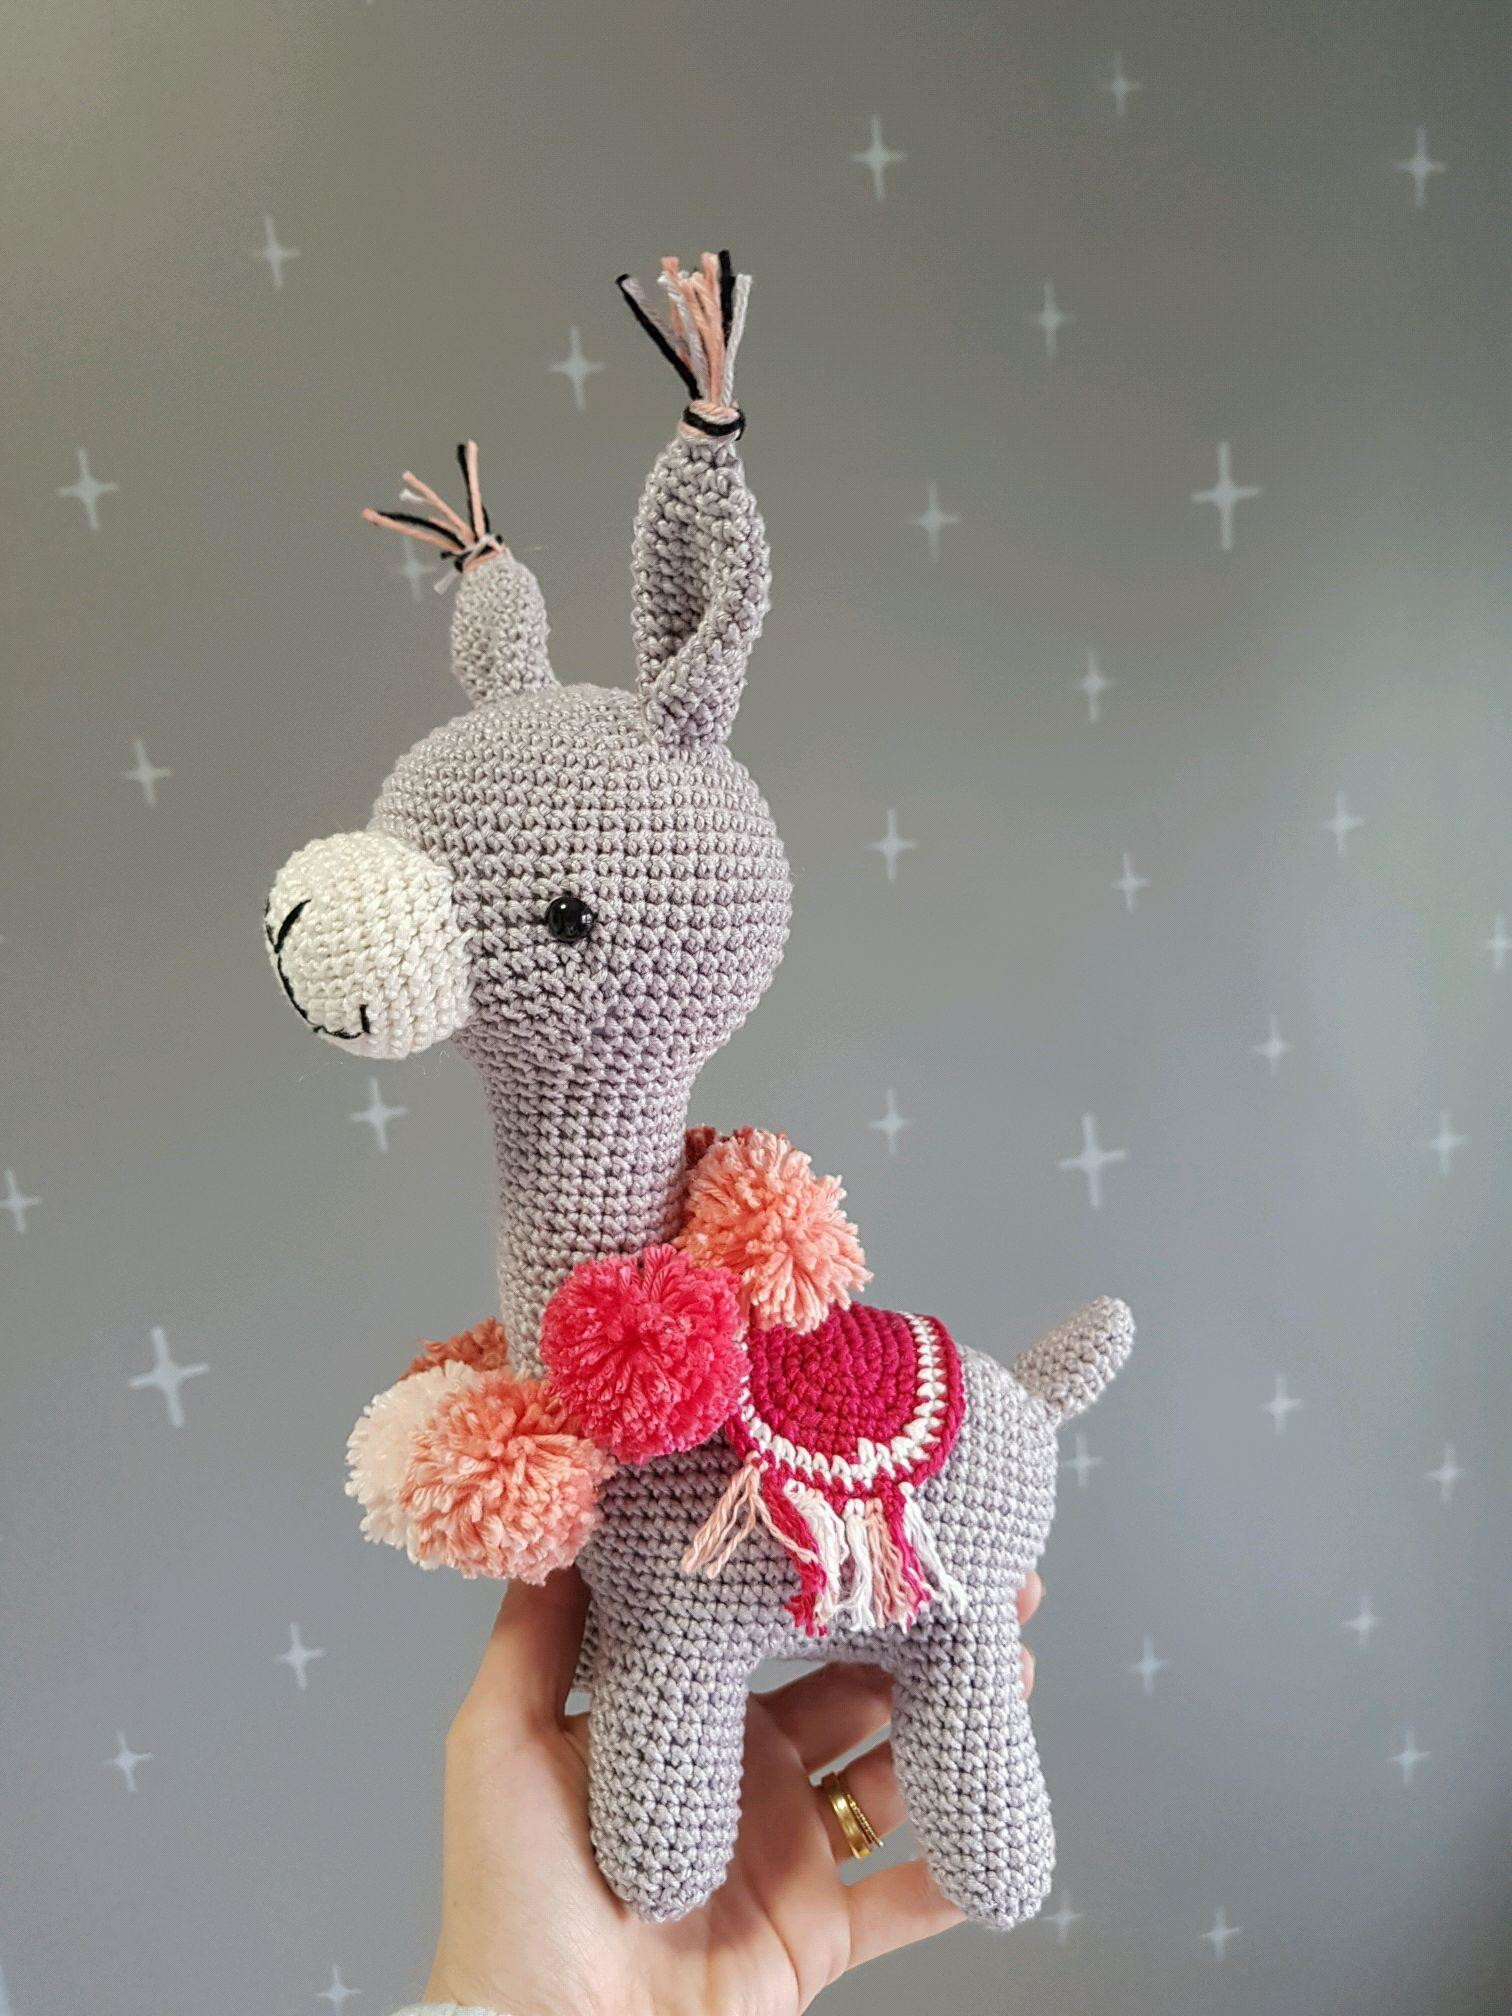 PICA PAU animal Unicorn LLAMA Alpaca Dog amigurumi crochet | Etsy | 2016x1512